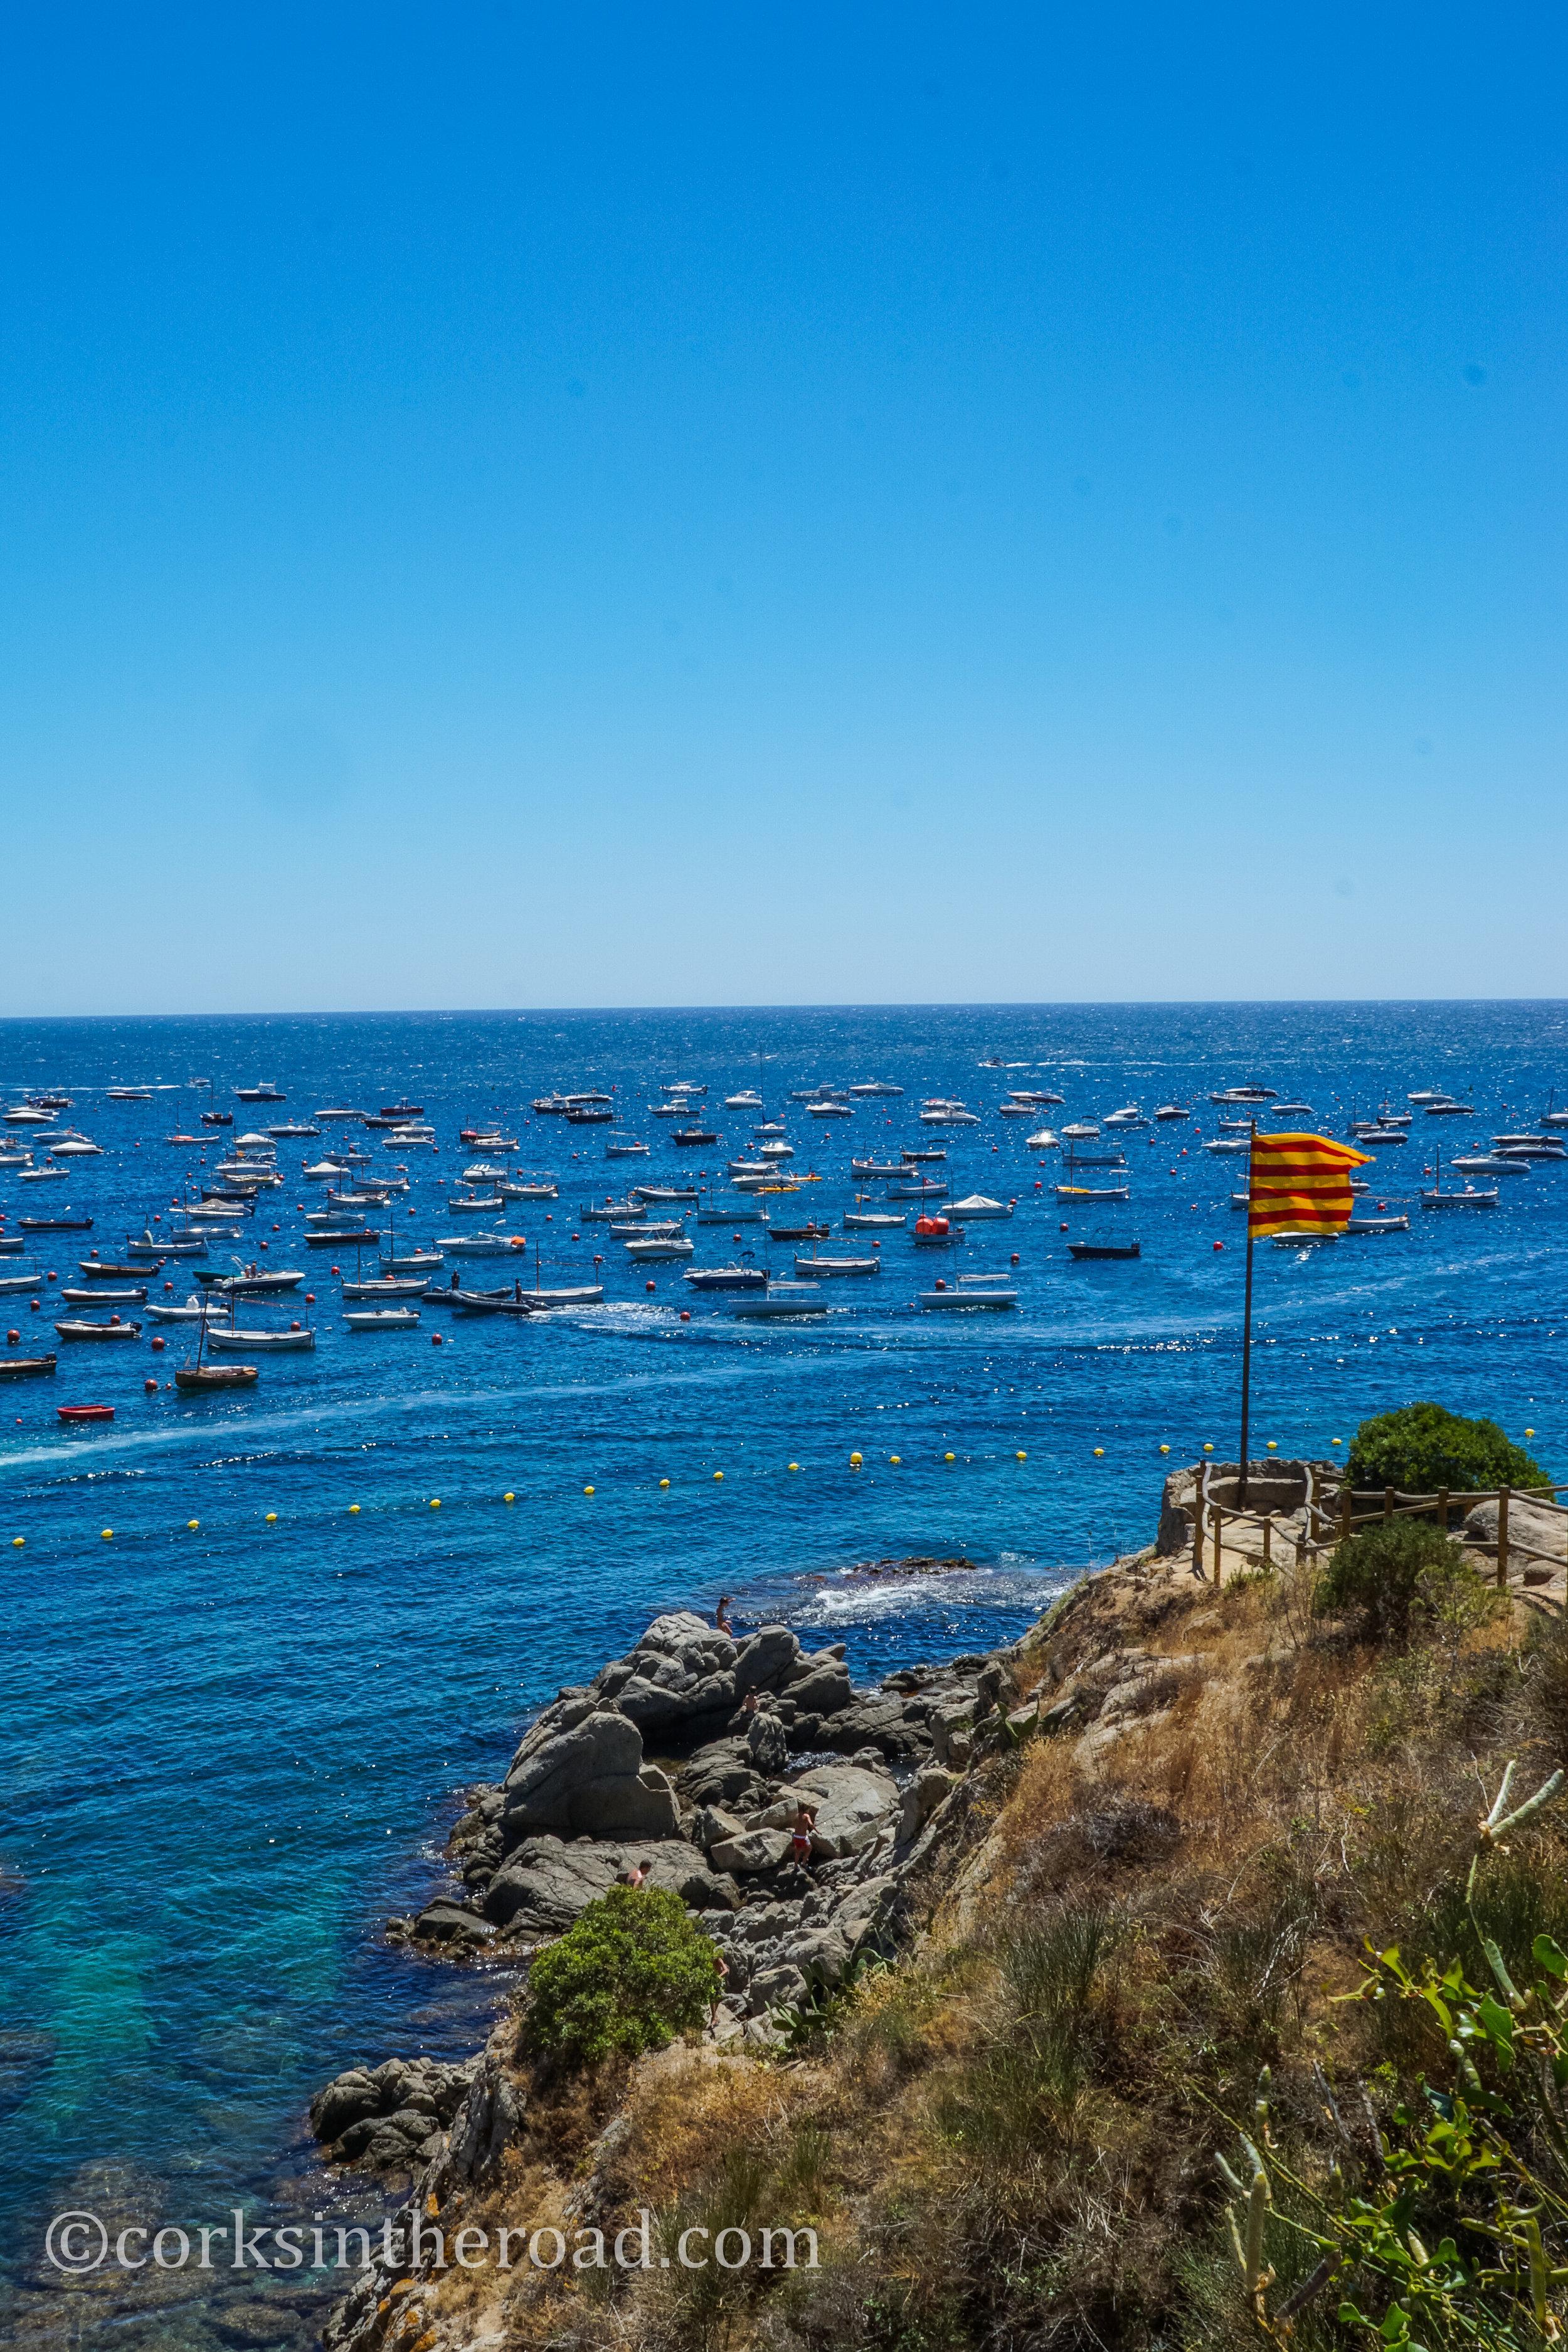 20160807Barcelona, Beaches, Corksintheroad, Costa Brava, Costa Brava Landscape-2.jpg